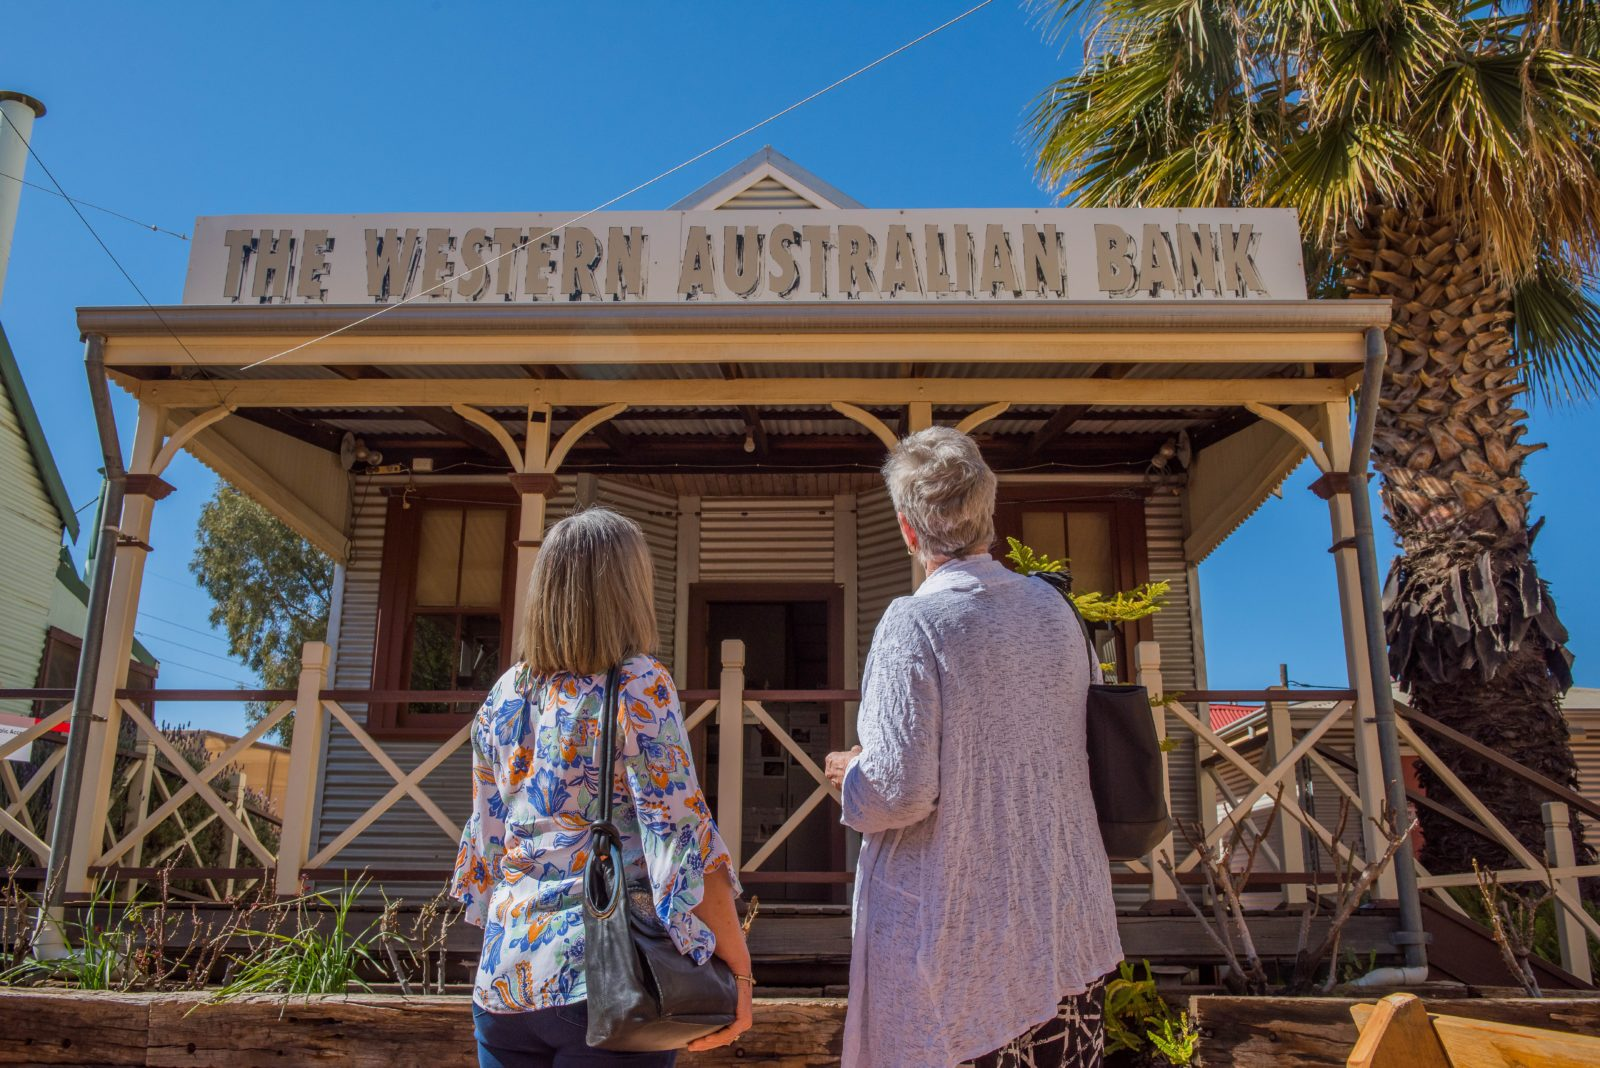 Museum of the Goldfields, Kalgoorlie, Western Australia